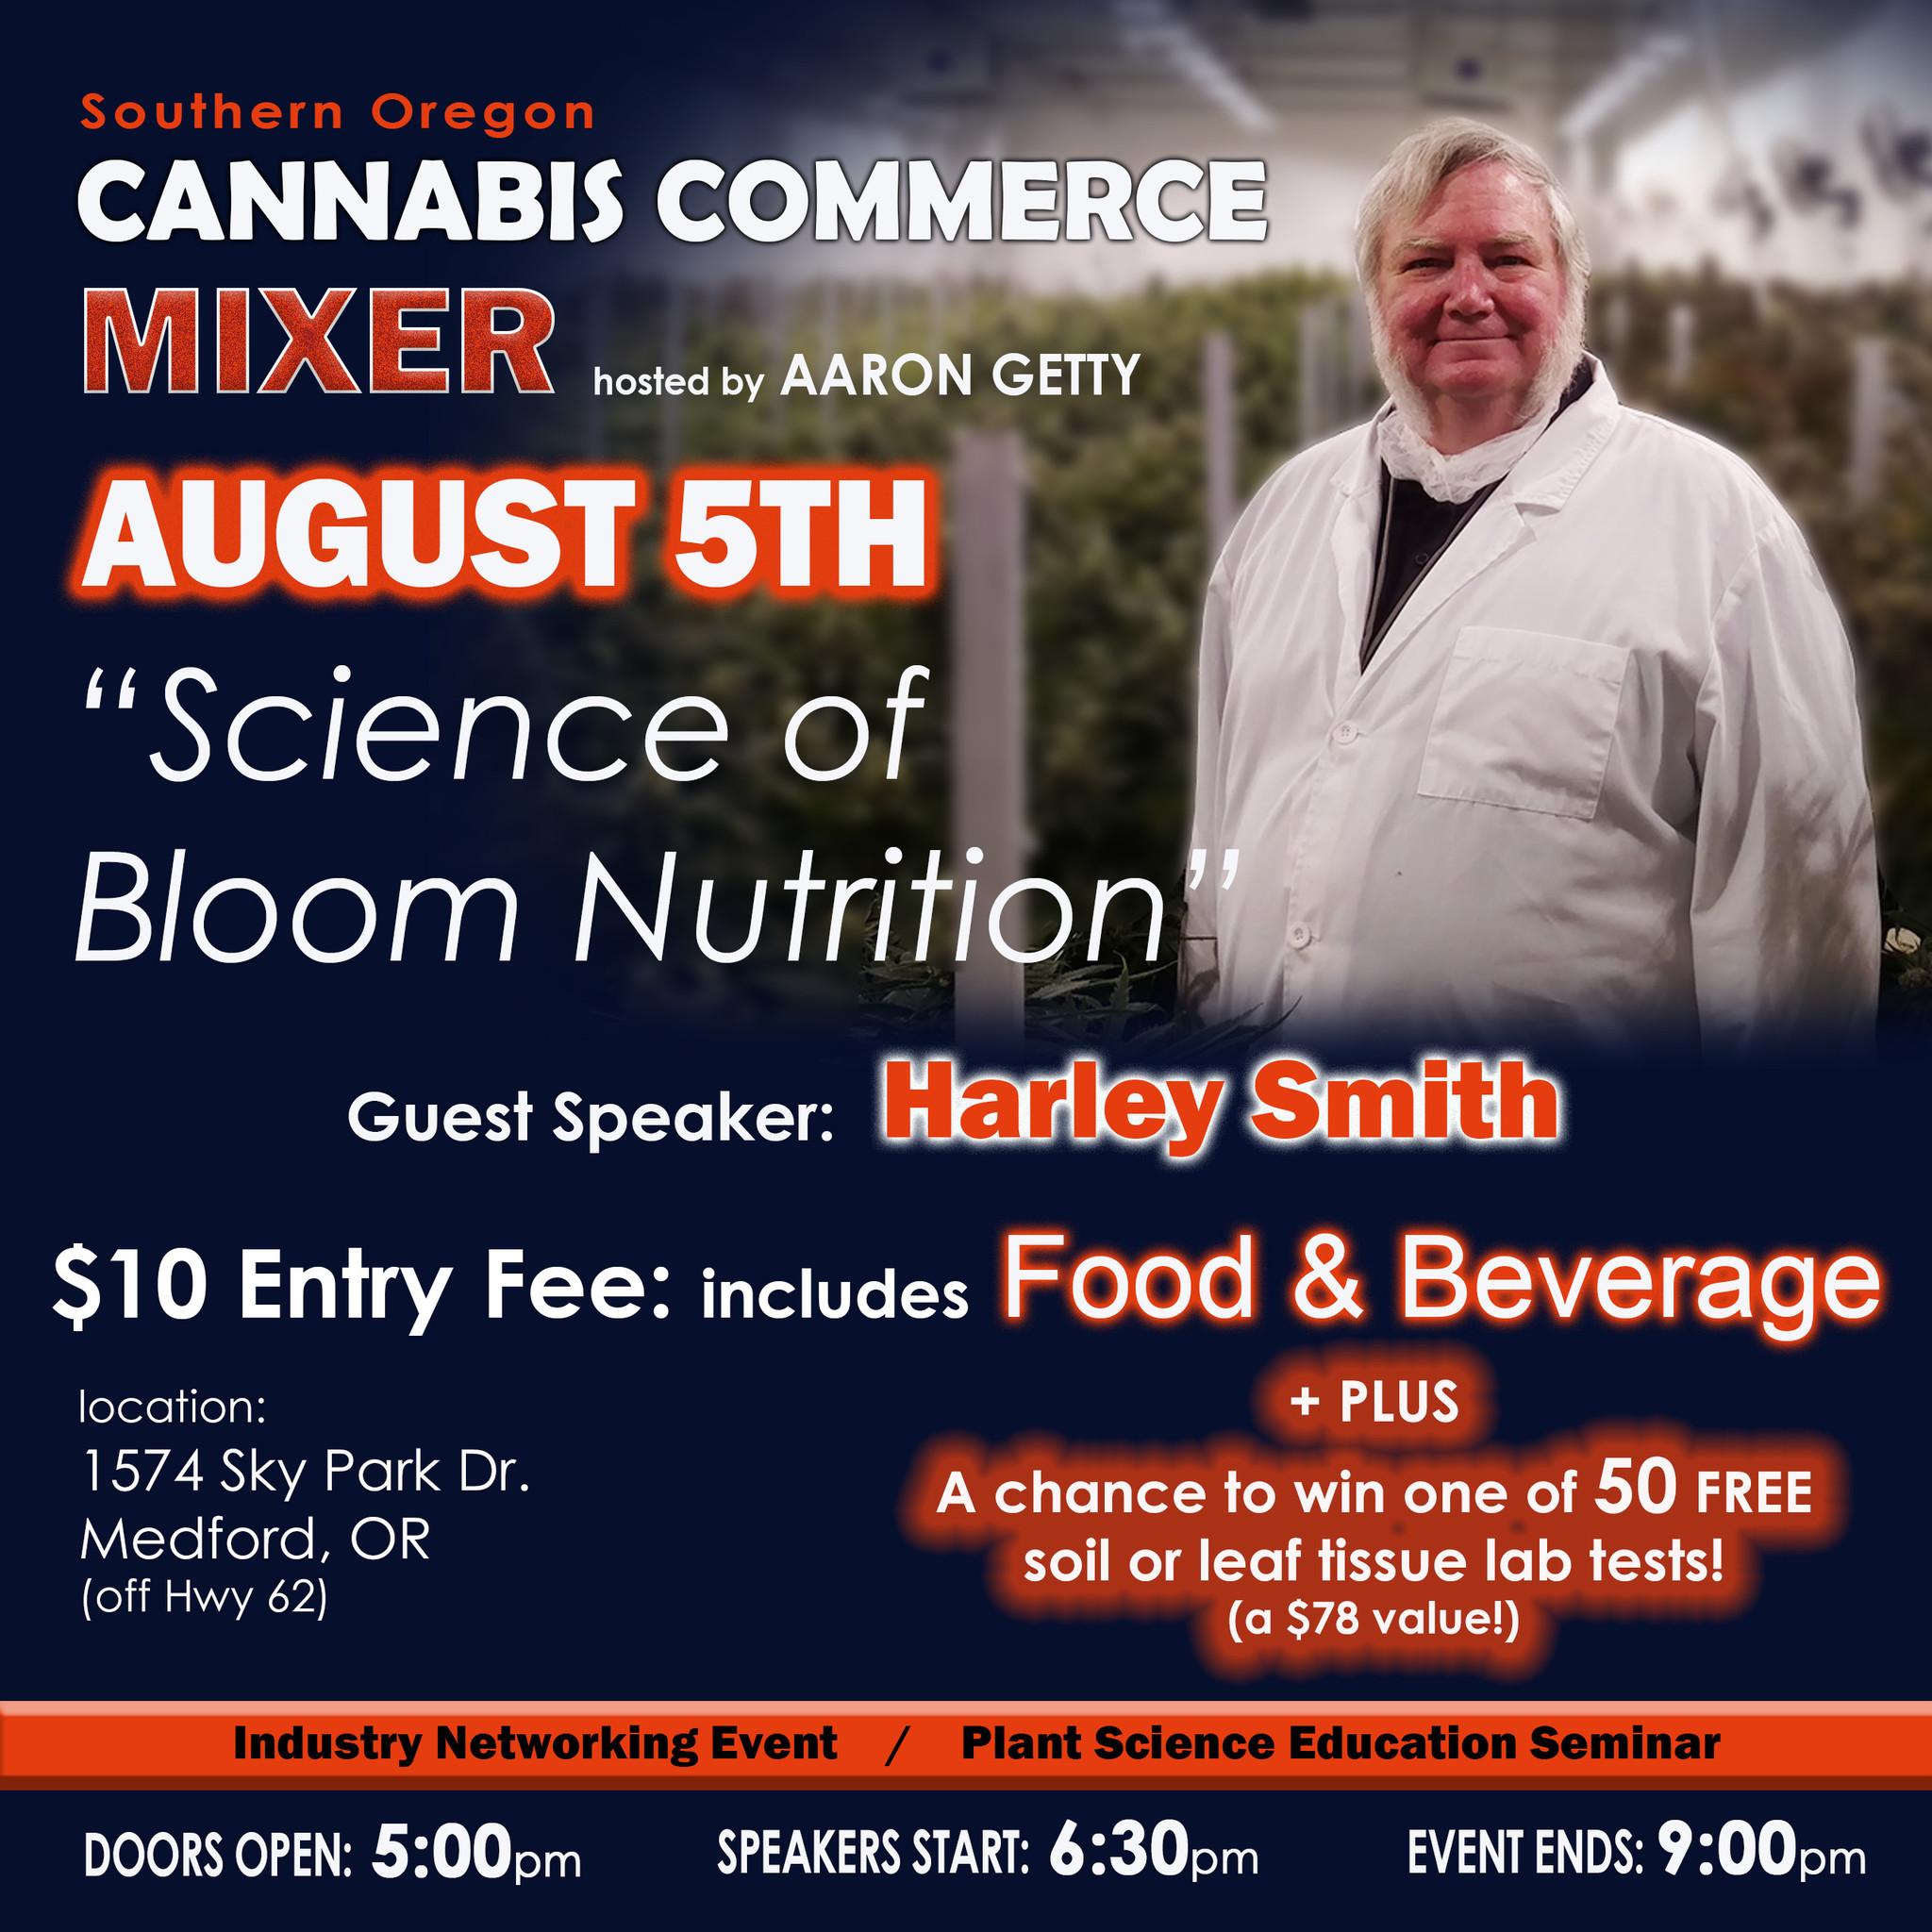 Southern Oregon Cannabis Commerce Mixer